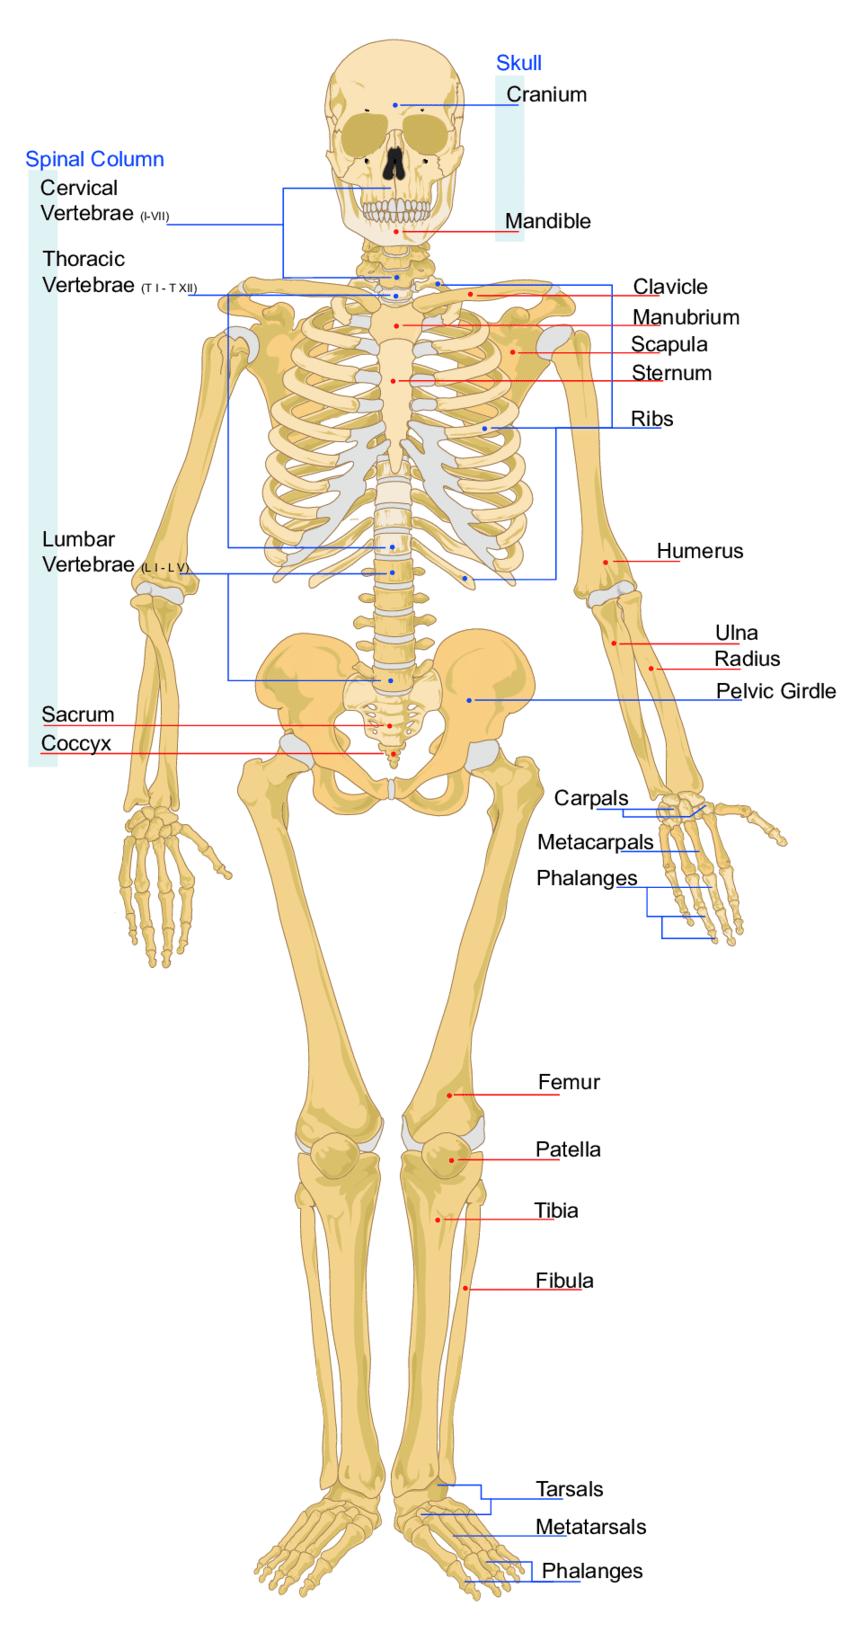 hight resolution of figure a 3 diagram of major human body bones source wikimedia 206 bones of the human body diagram human body bones diagram